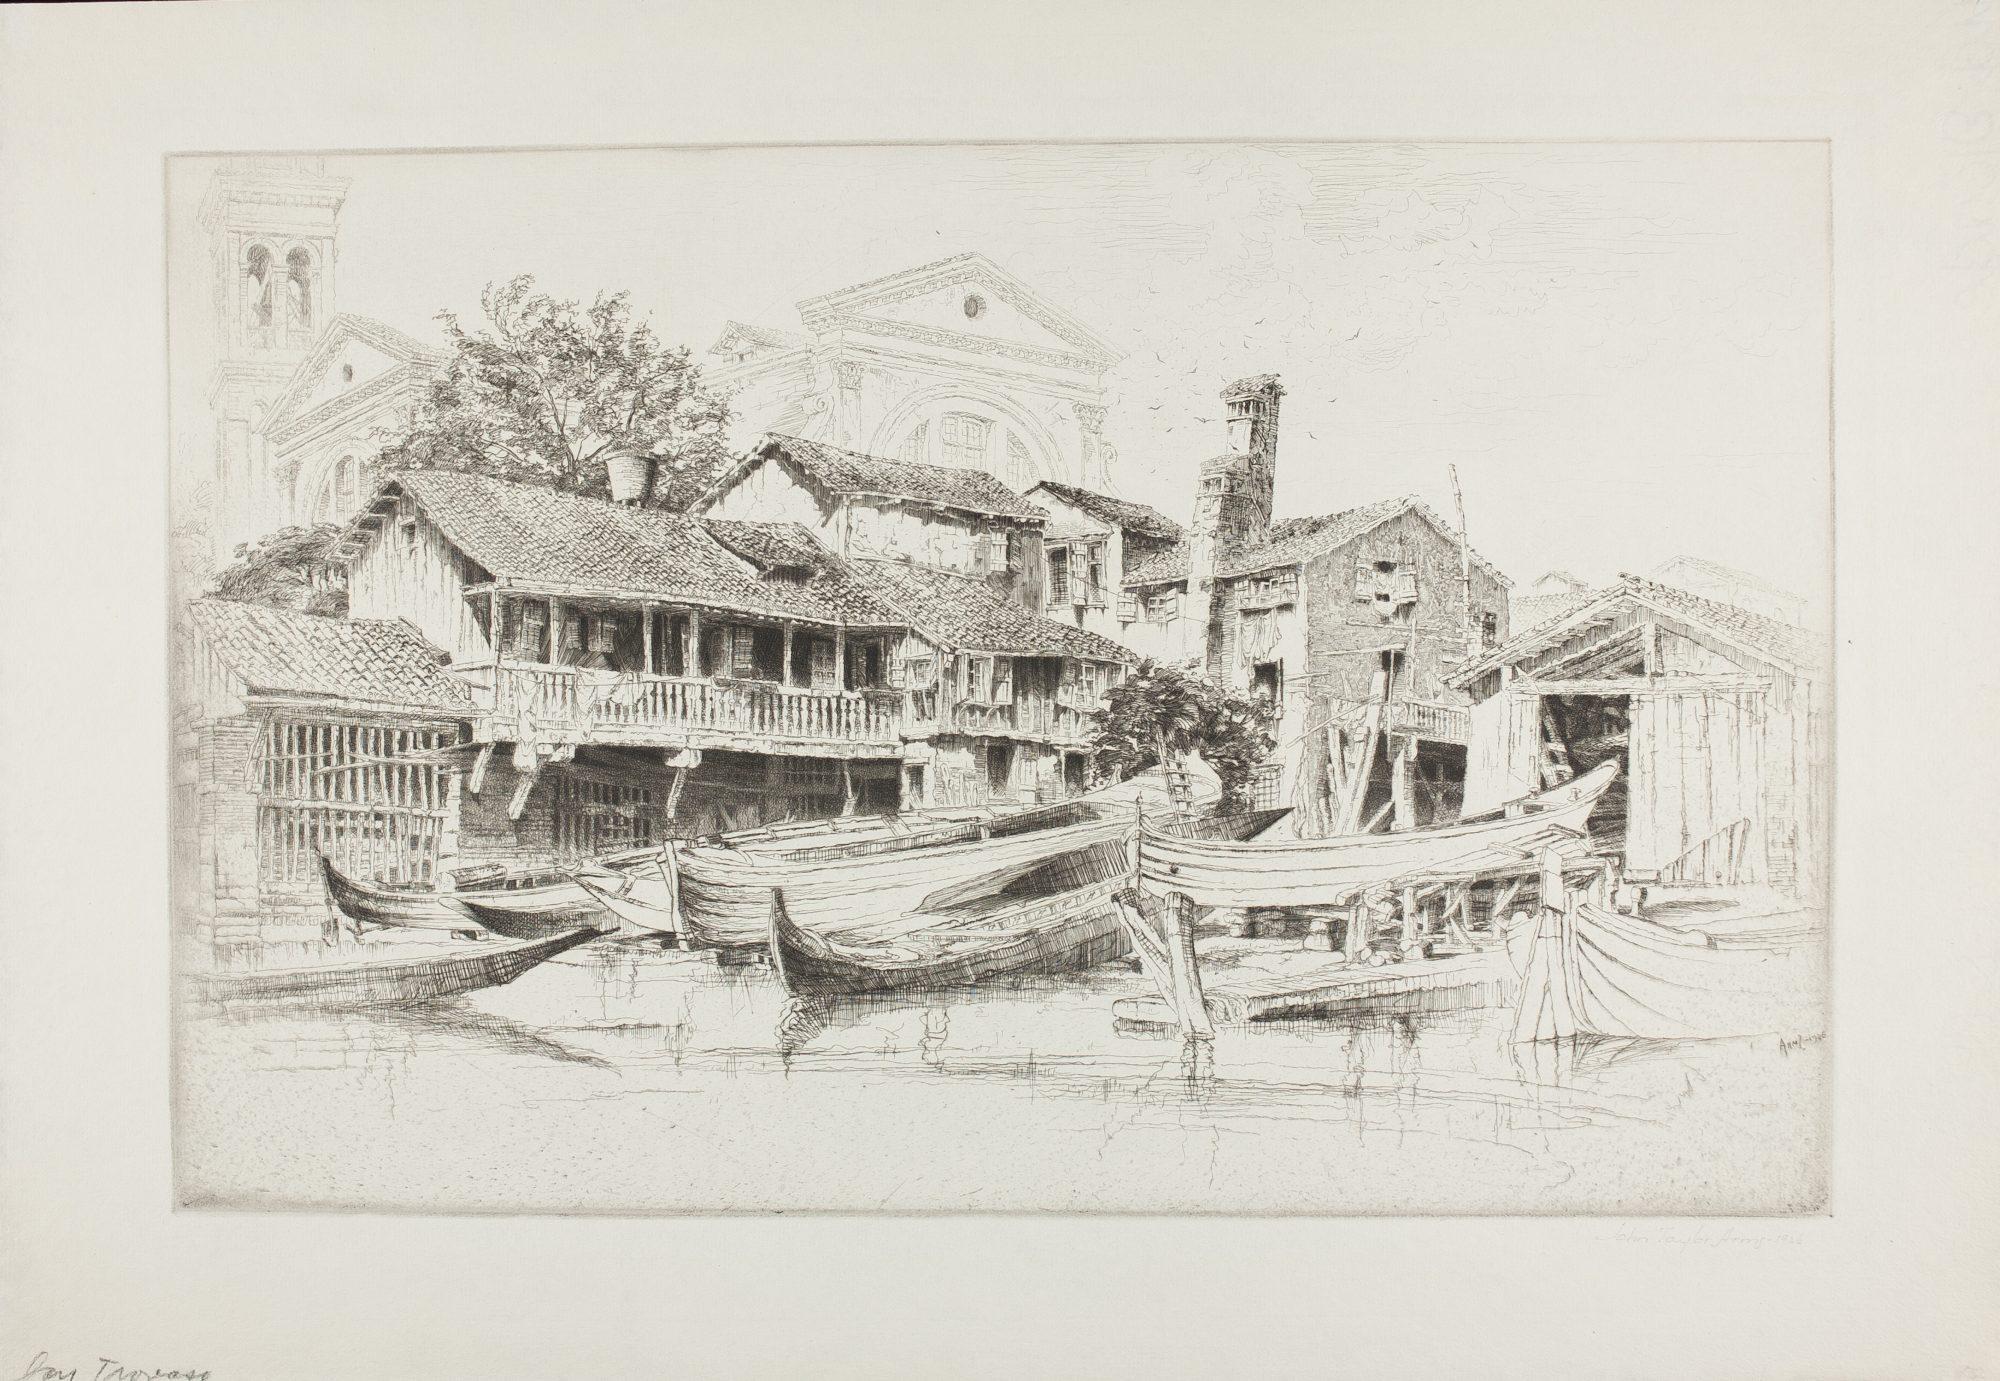 John Taylor Arms (American, 1887-1953) The Boat Builder's Yard, San Trovaso, Venice